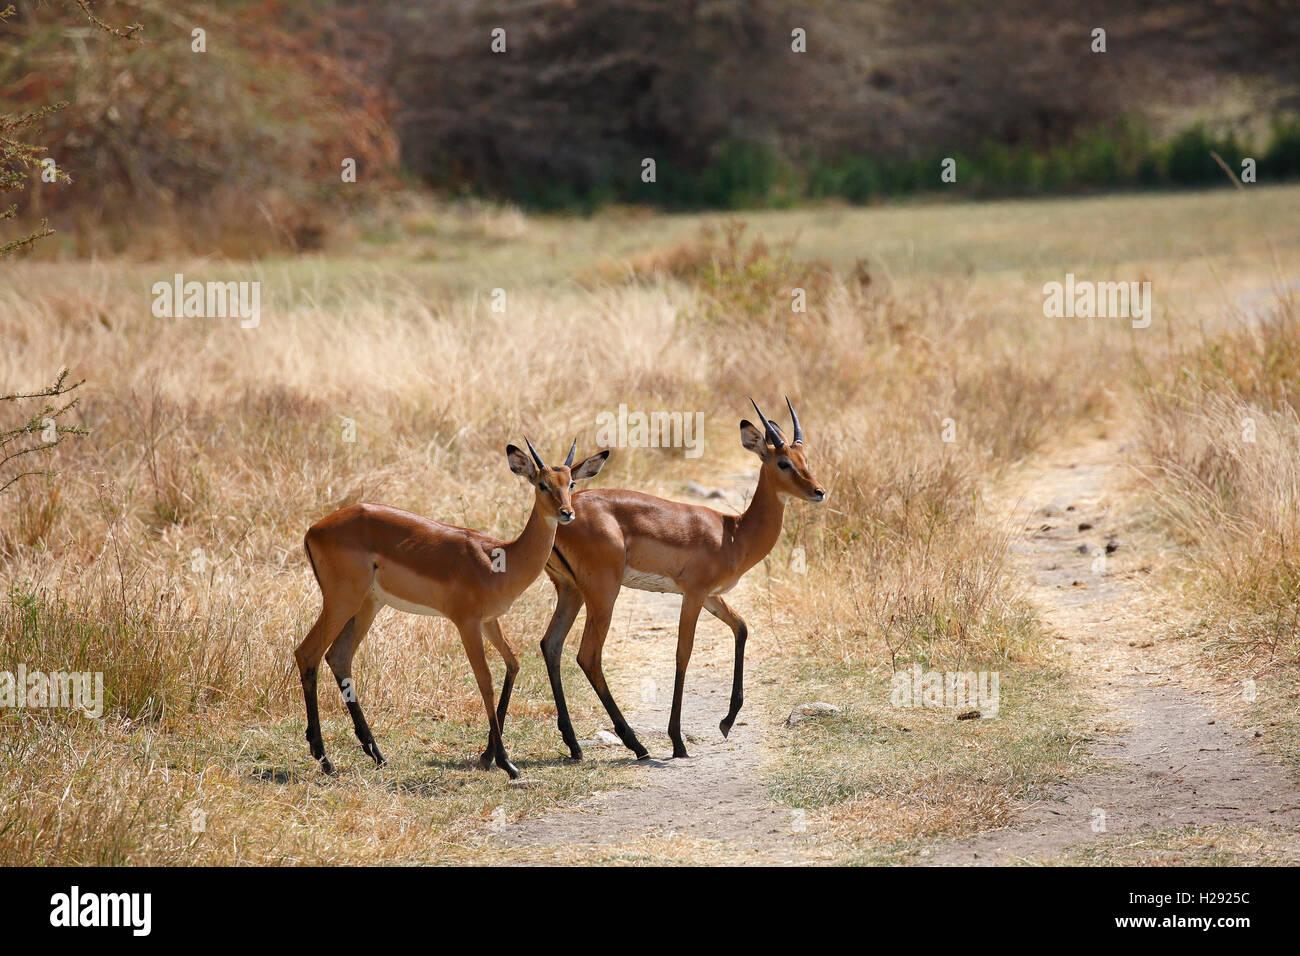 Impala (Aepyceros melampus), Lake Manyara National Park, Tanzania - Stock Image